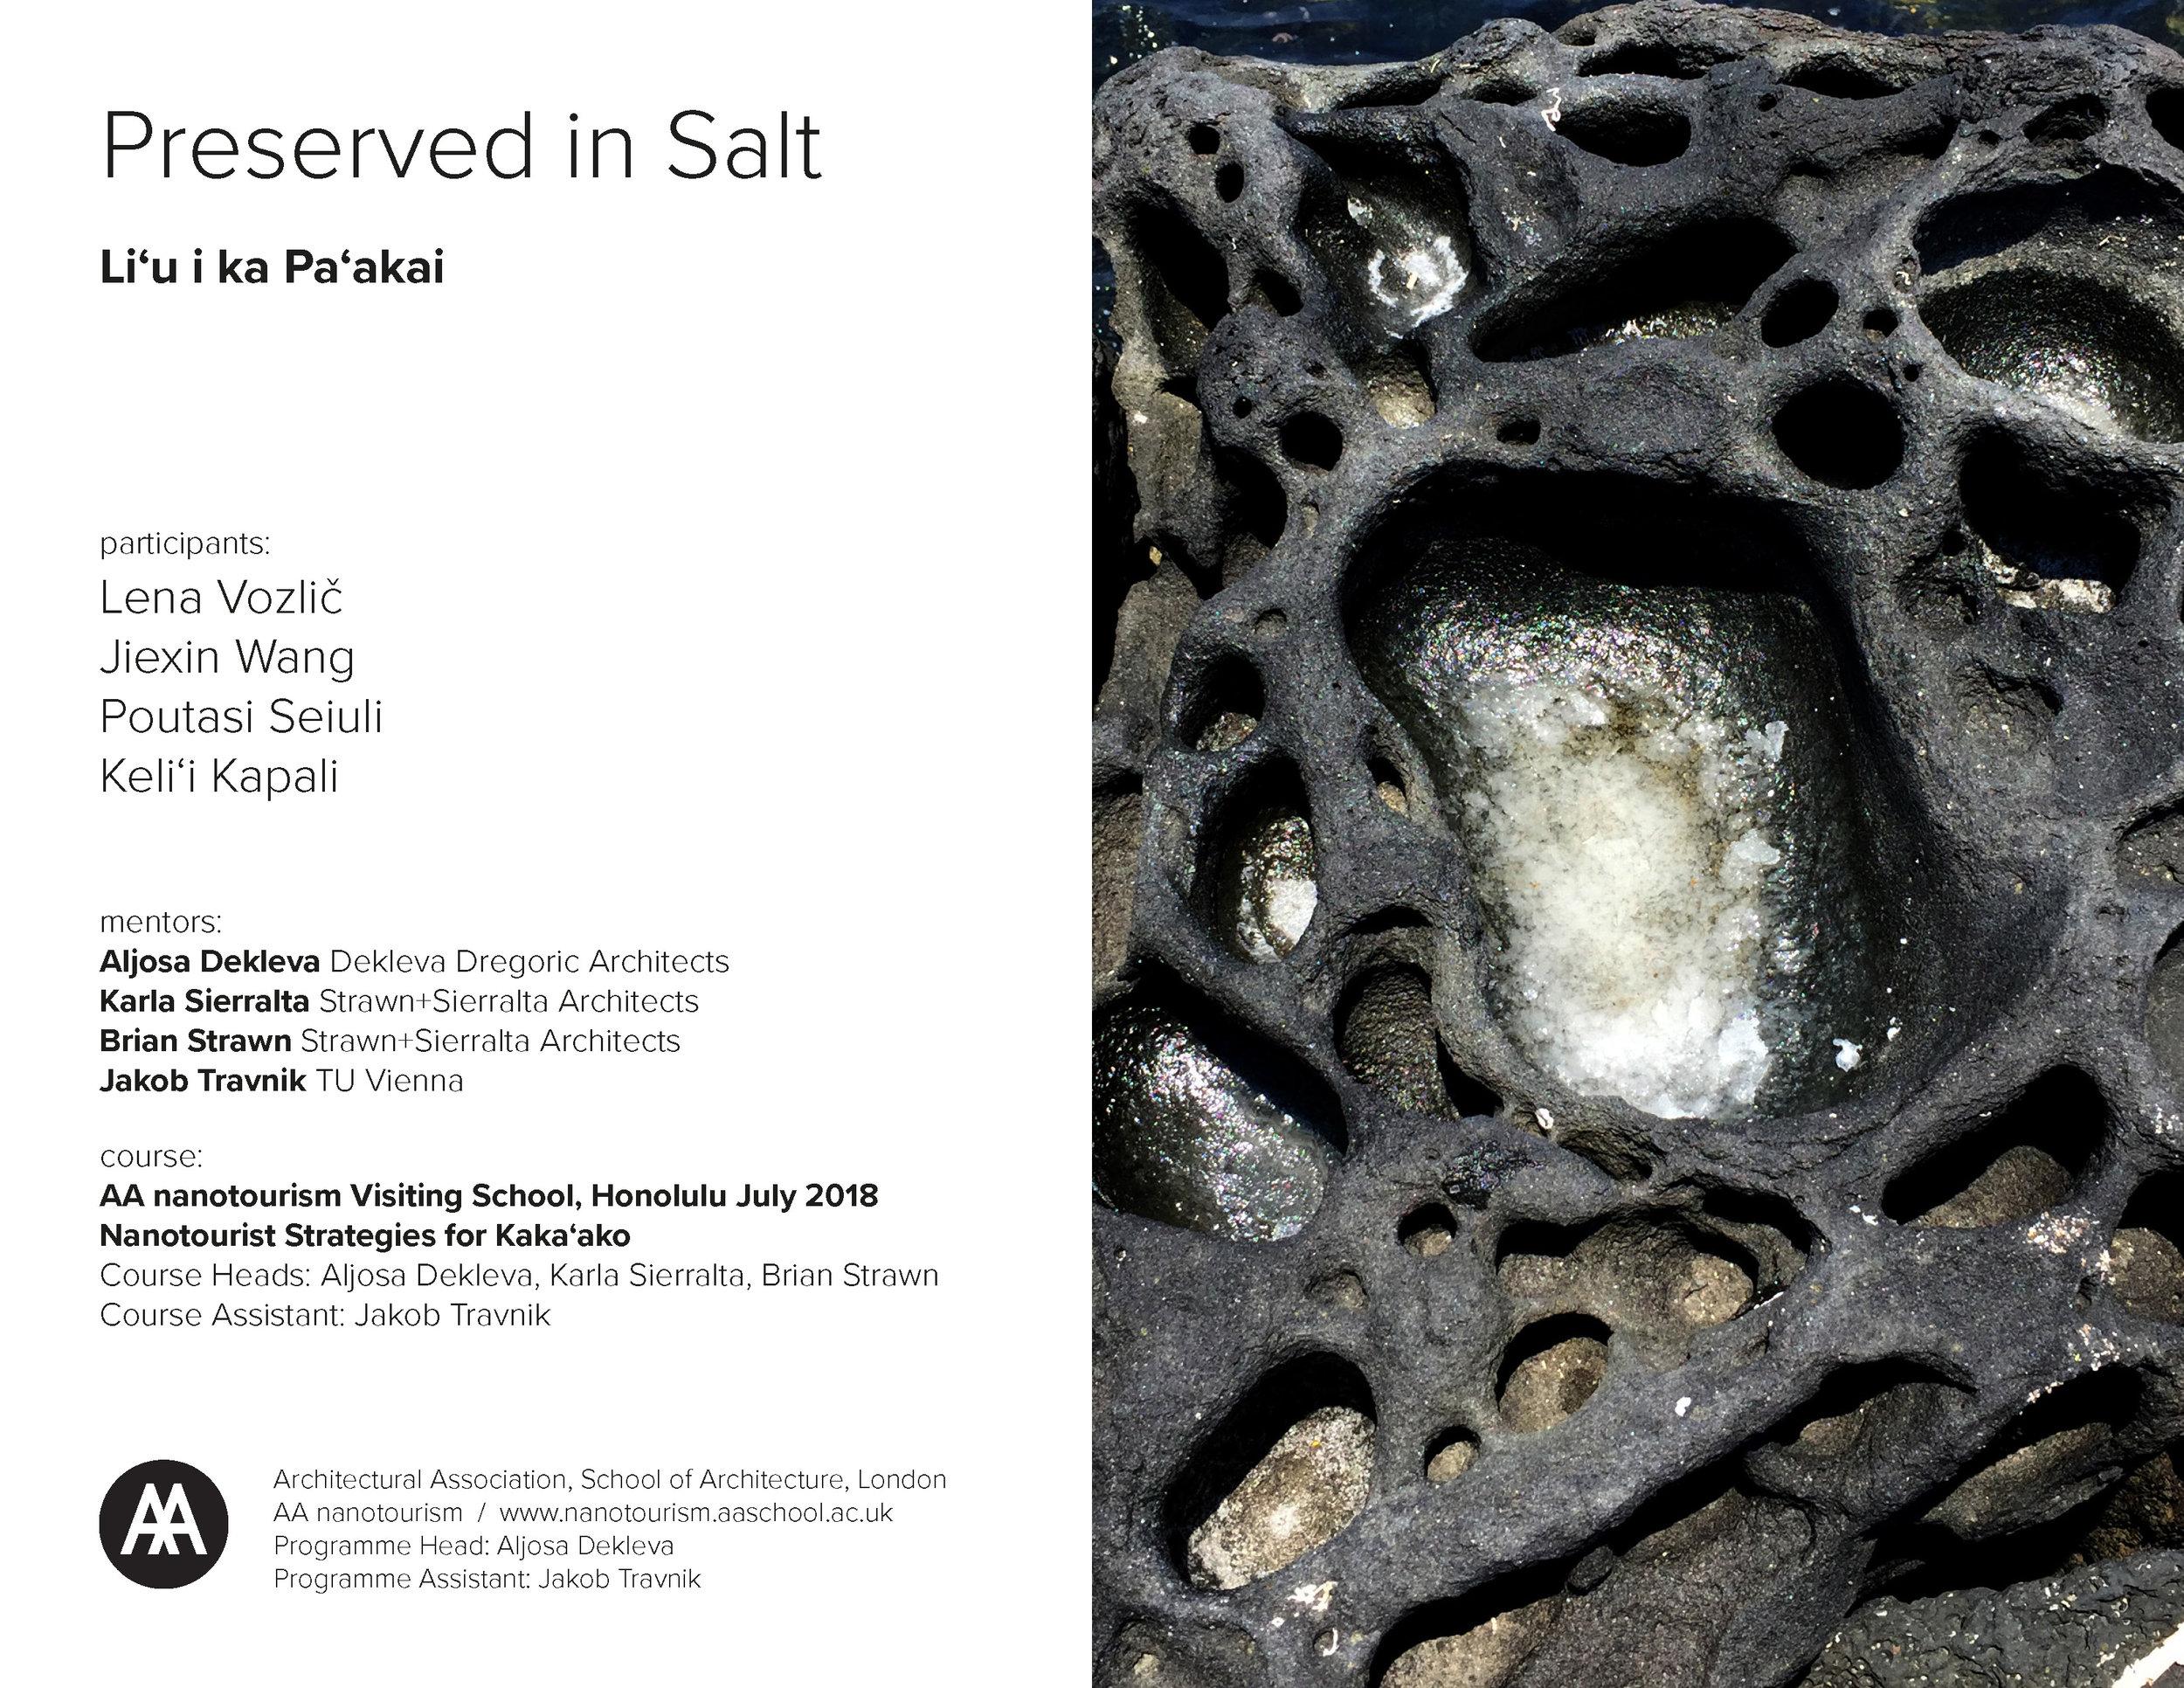 AAnt18_Salt Group_pdfpresentation_final_Page_01.jpg